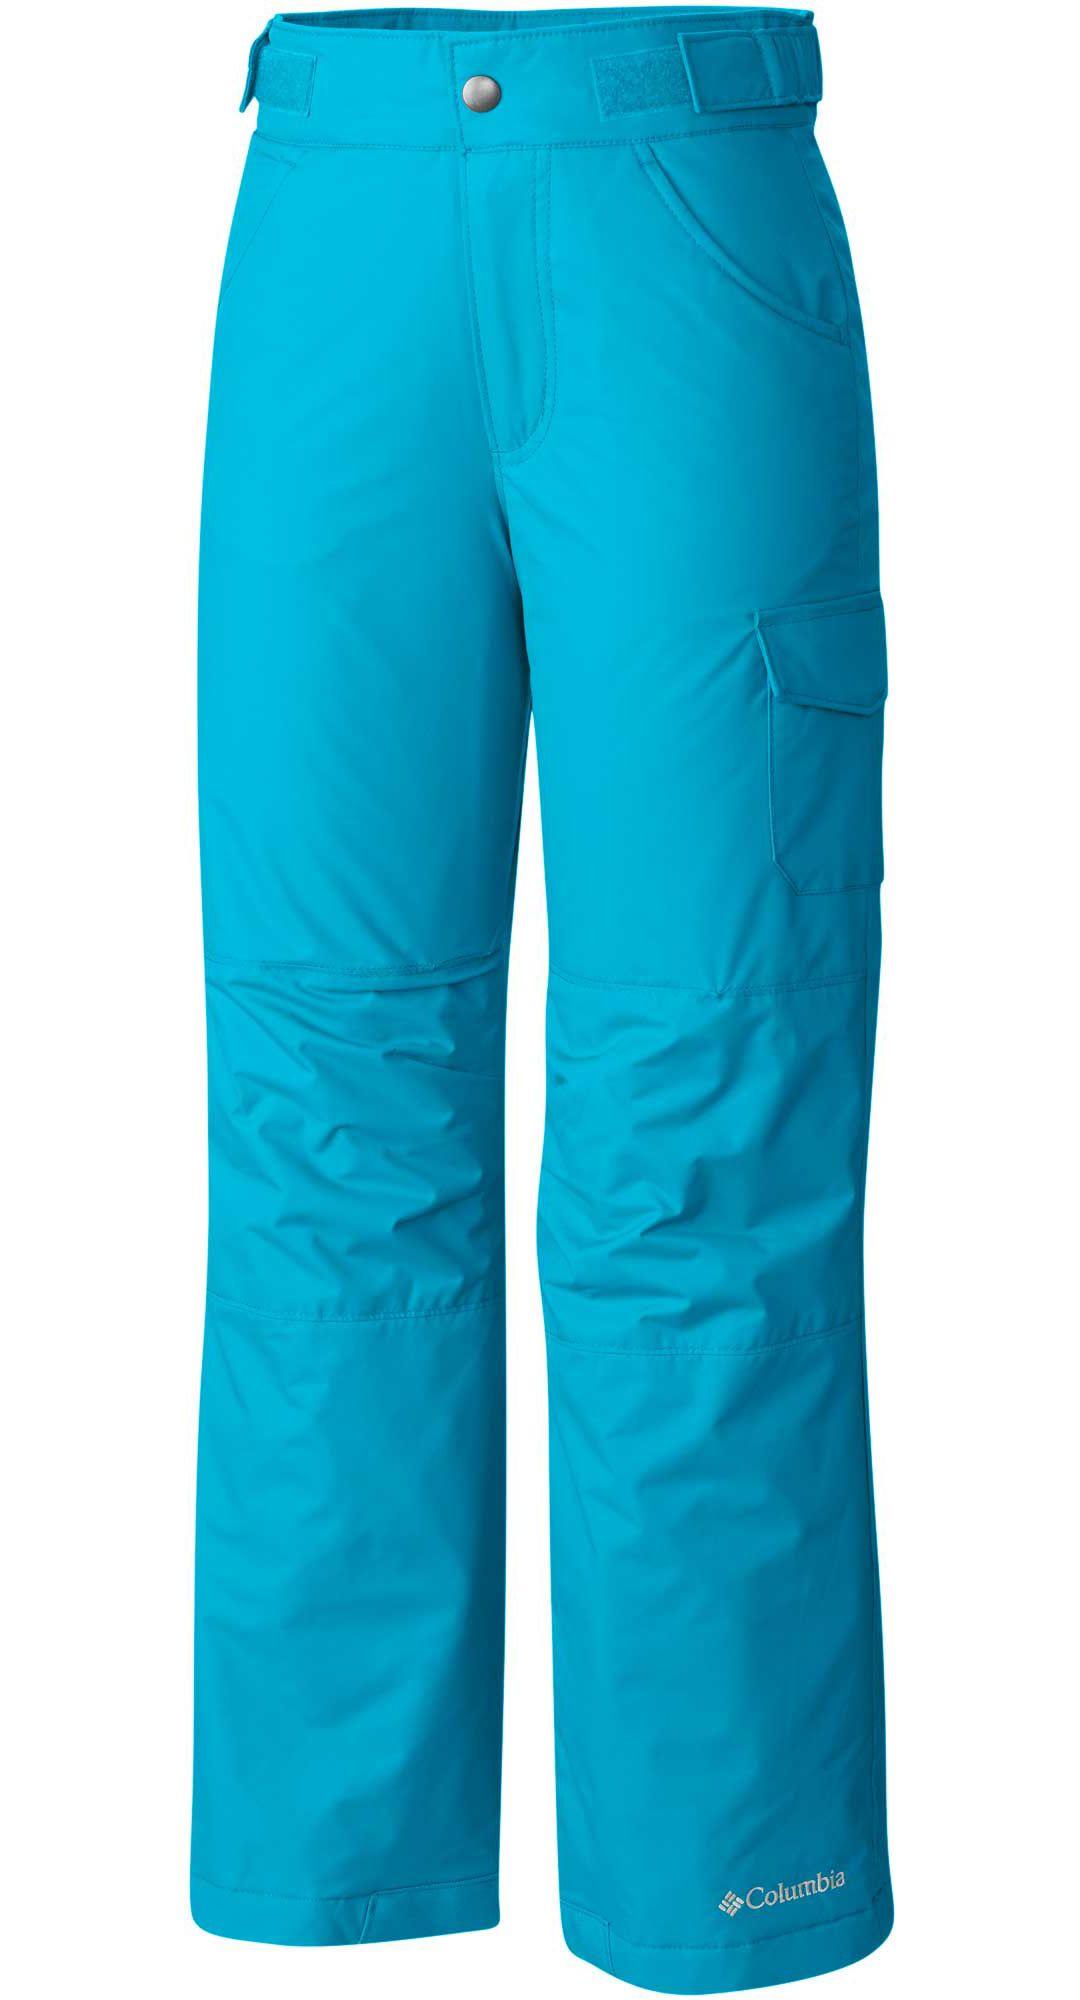 4e44f7566ca Columbia Girls' Starchaser Peak II Insulated Pants